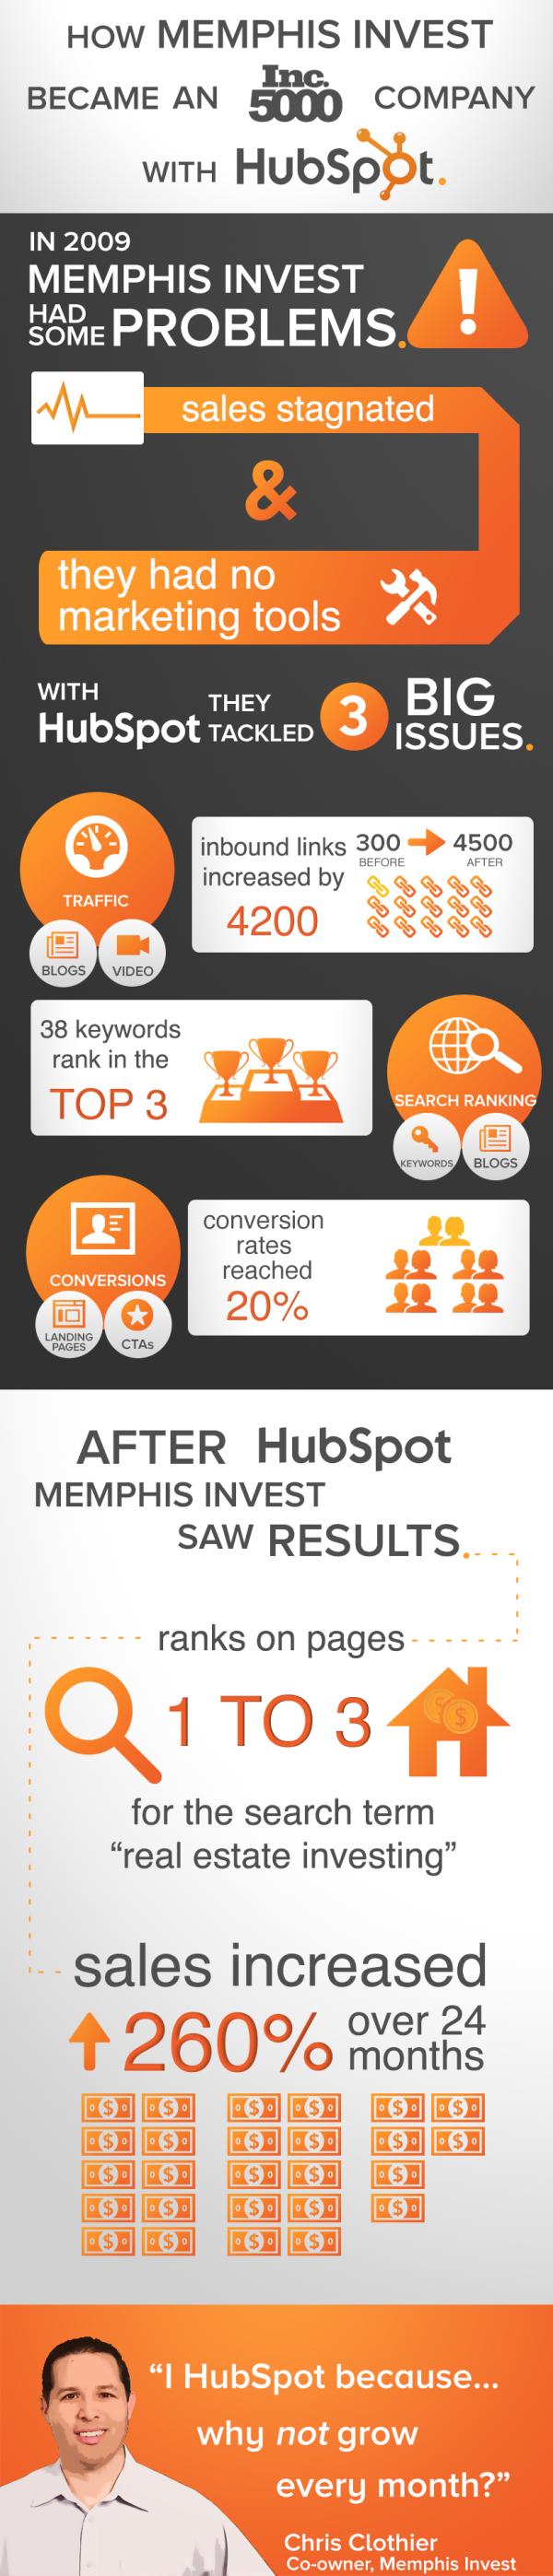 MemphisInvestCaseStudyInfographic resized 600